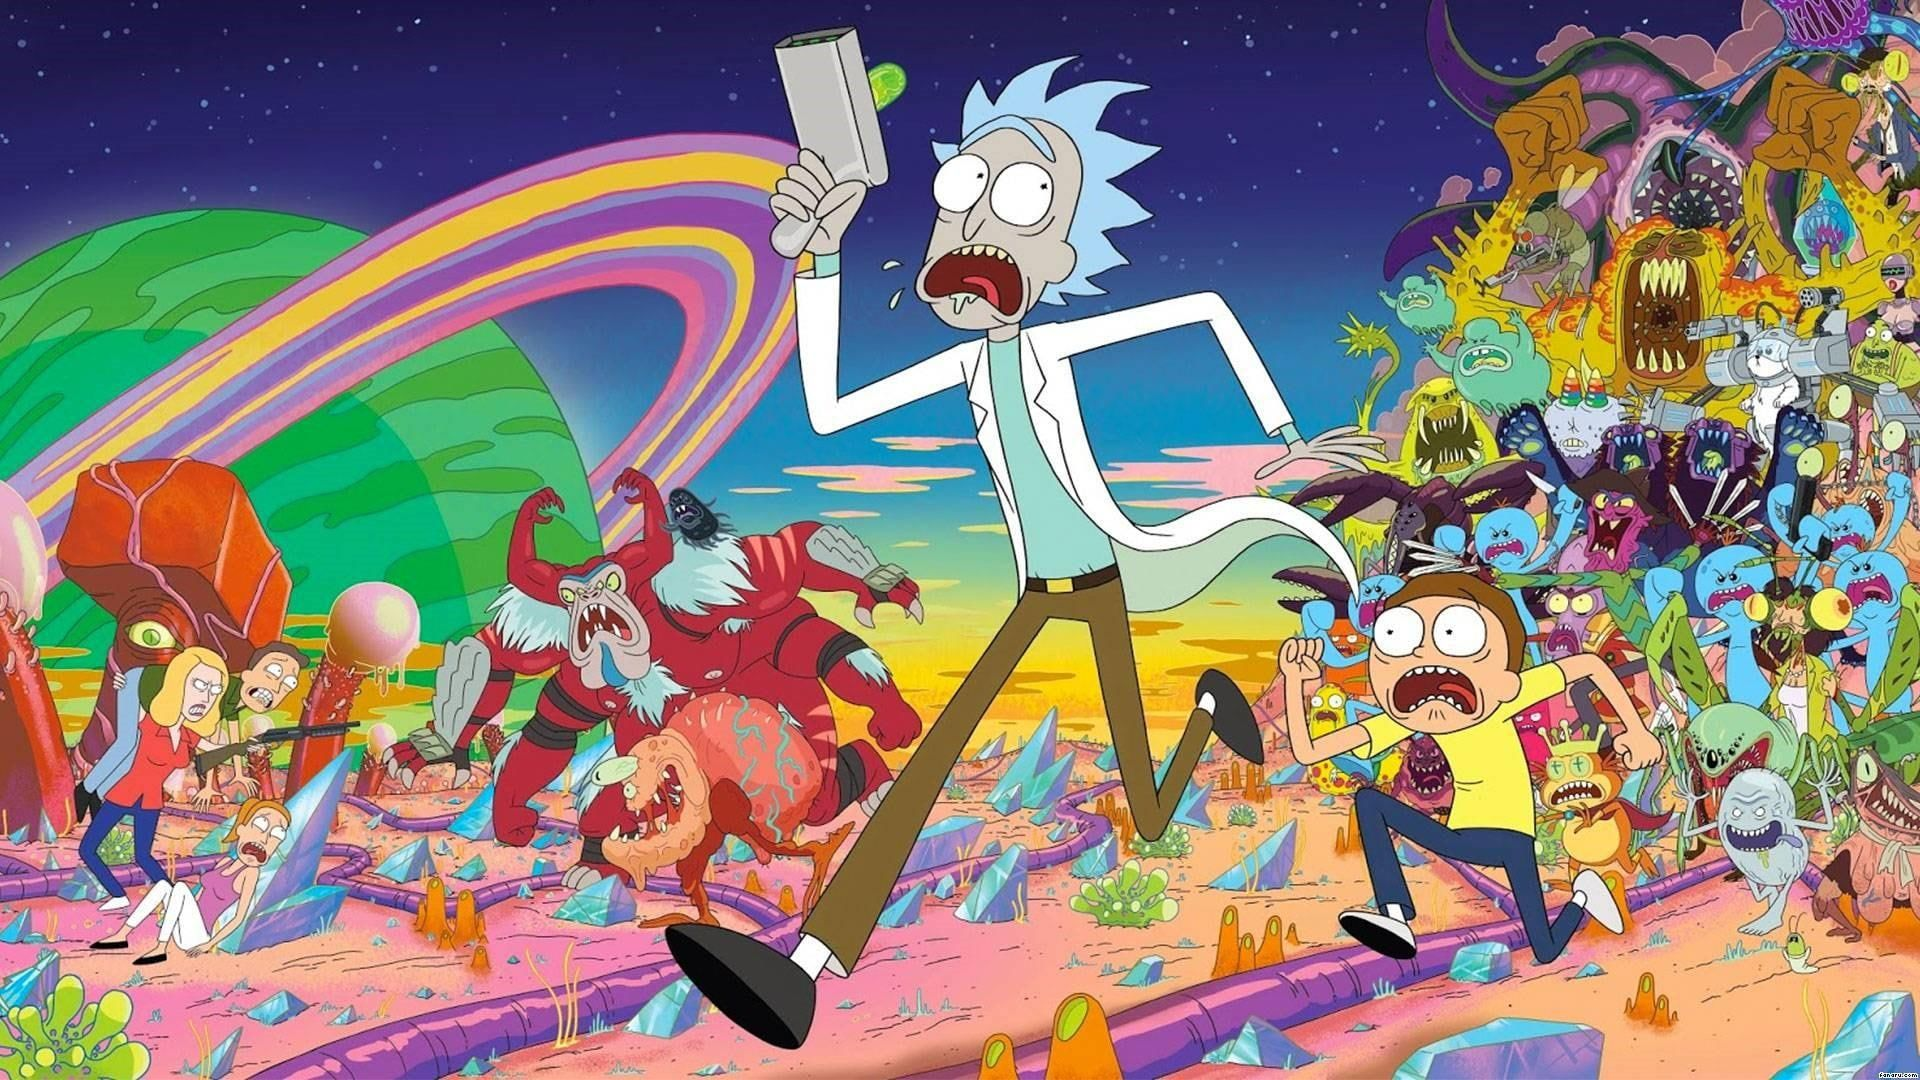 Rick And Morty Anime 1080p Wallpaper Hdwallpaper Desktop Cartoon Wallpaper Rick And Morty Poster Rick And Morty Season